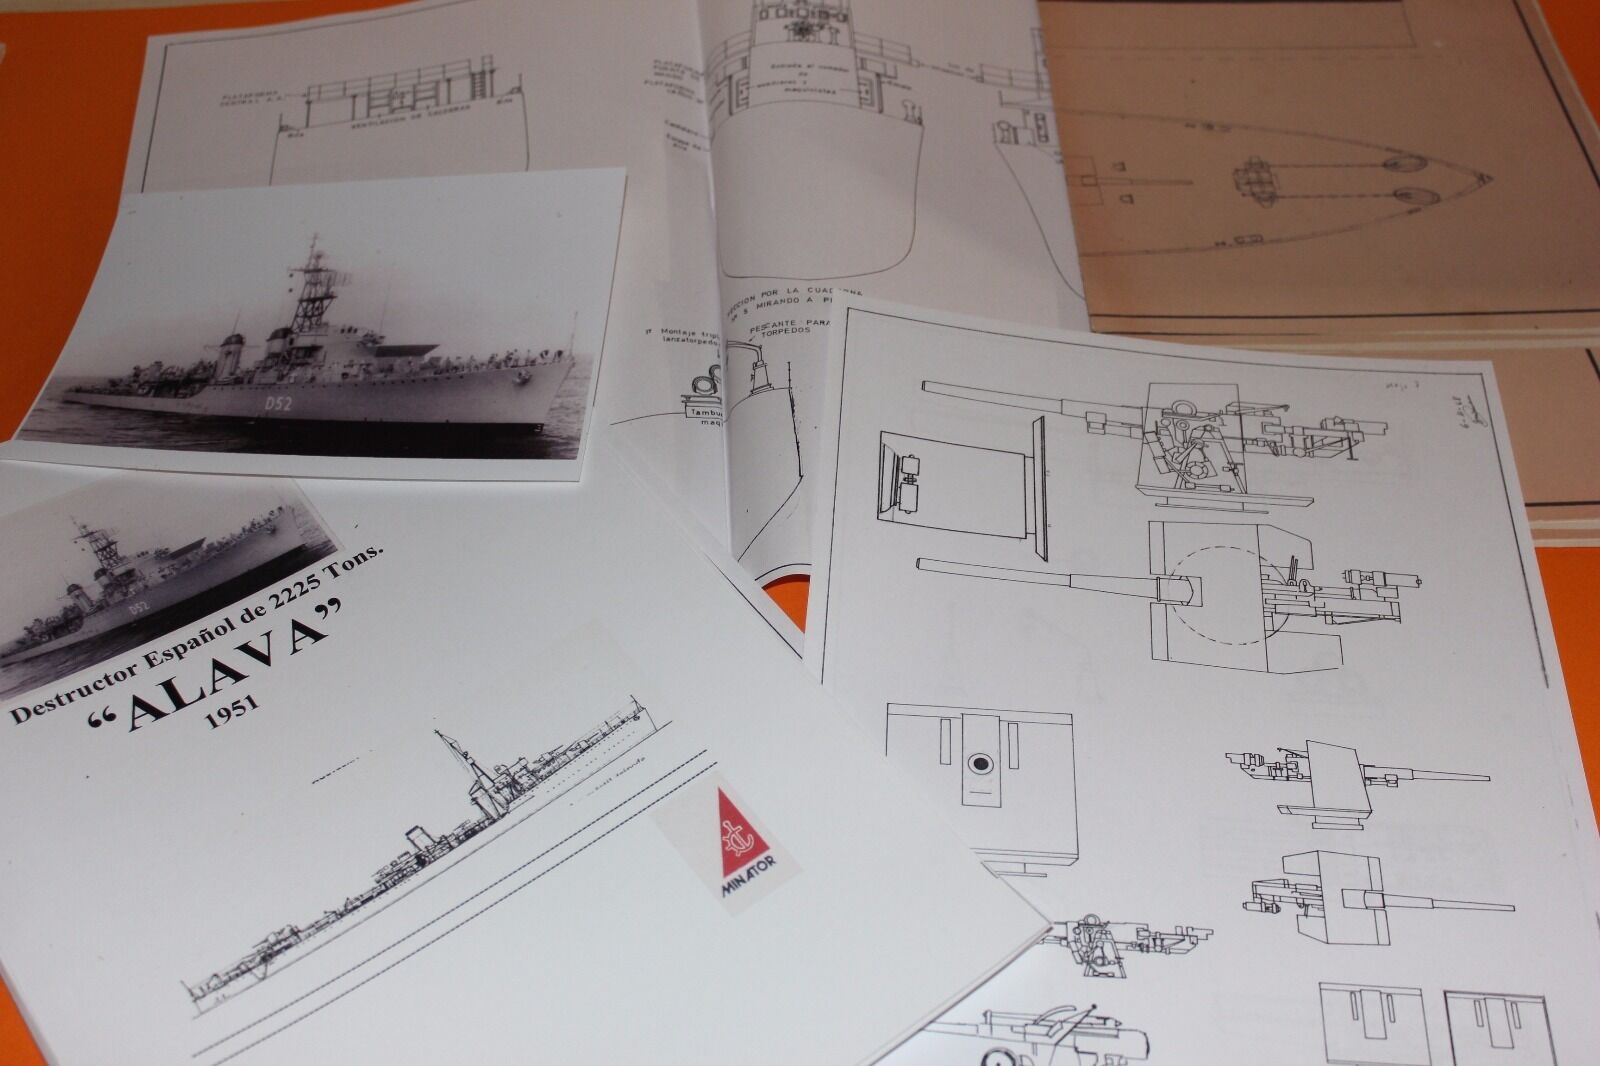 Plano Destructor español Álava modelismo naval